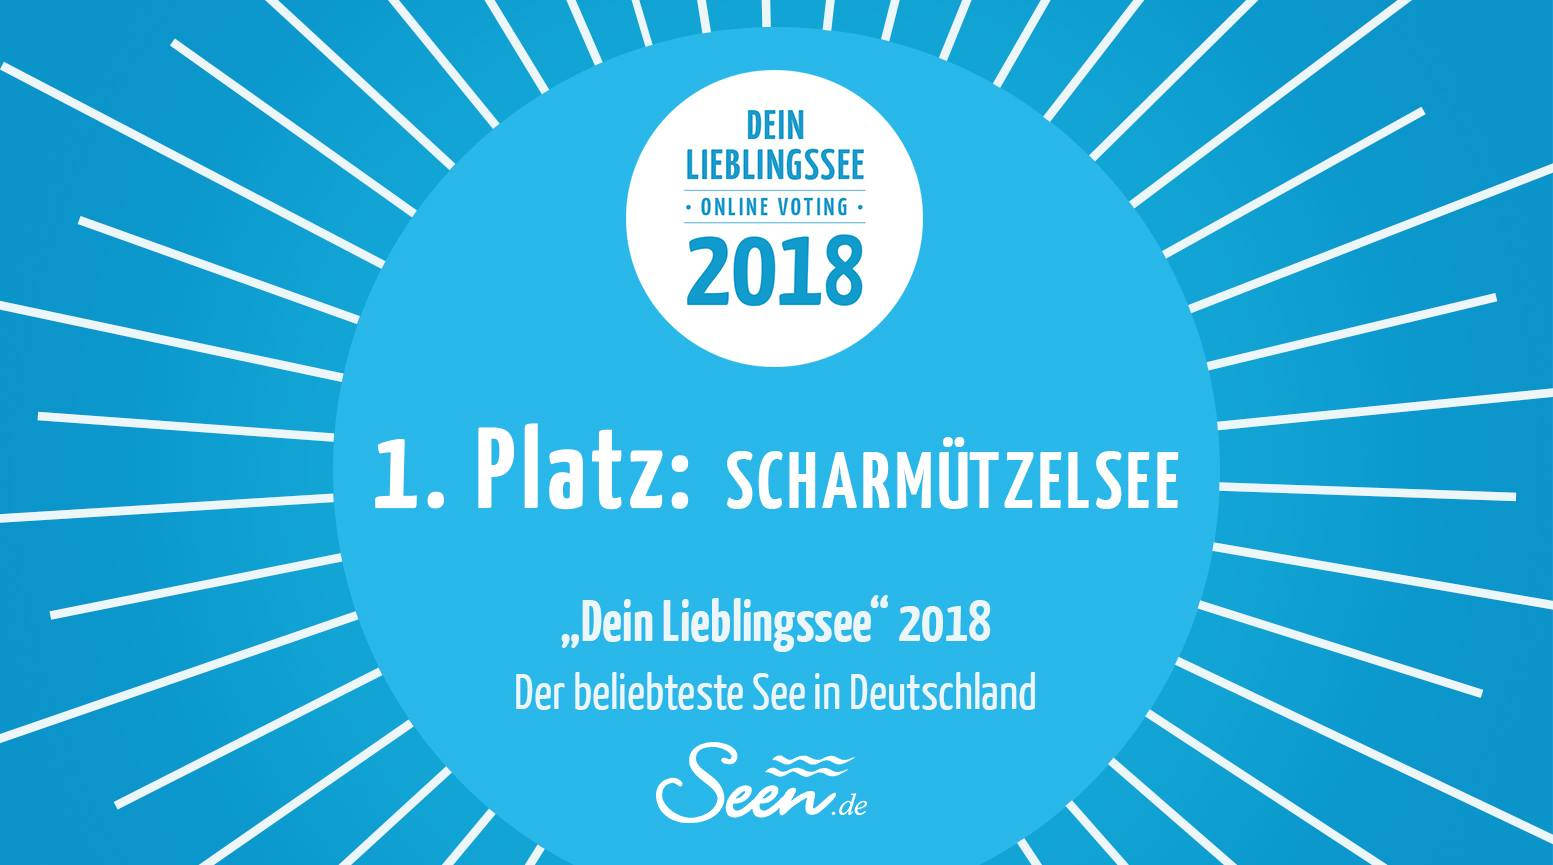 Deutschlands Lieblingsee 2018